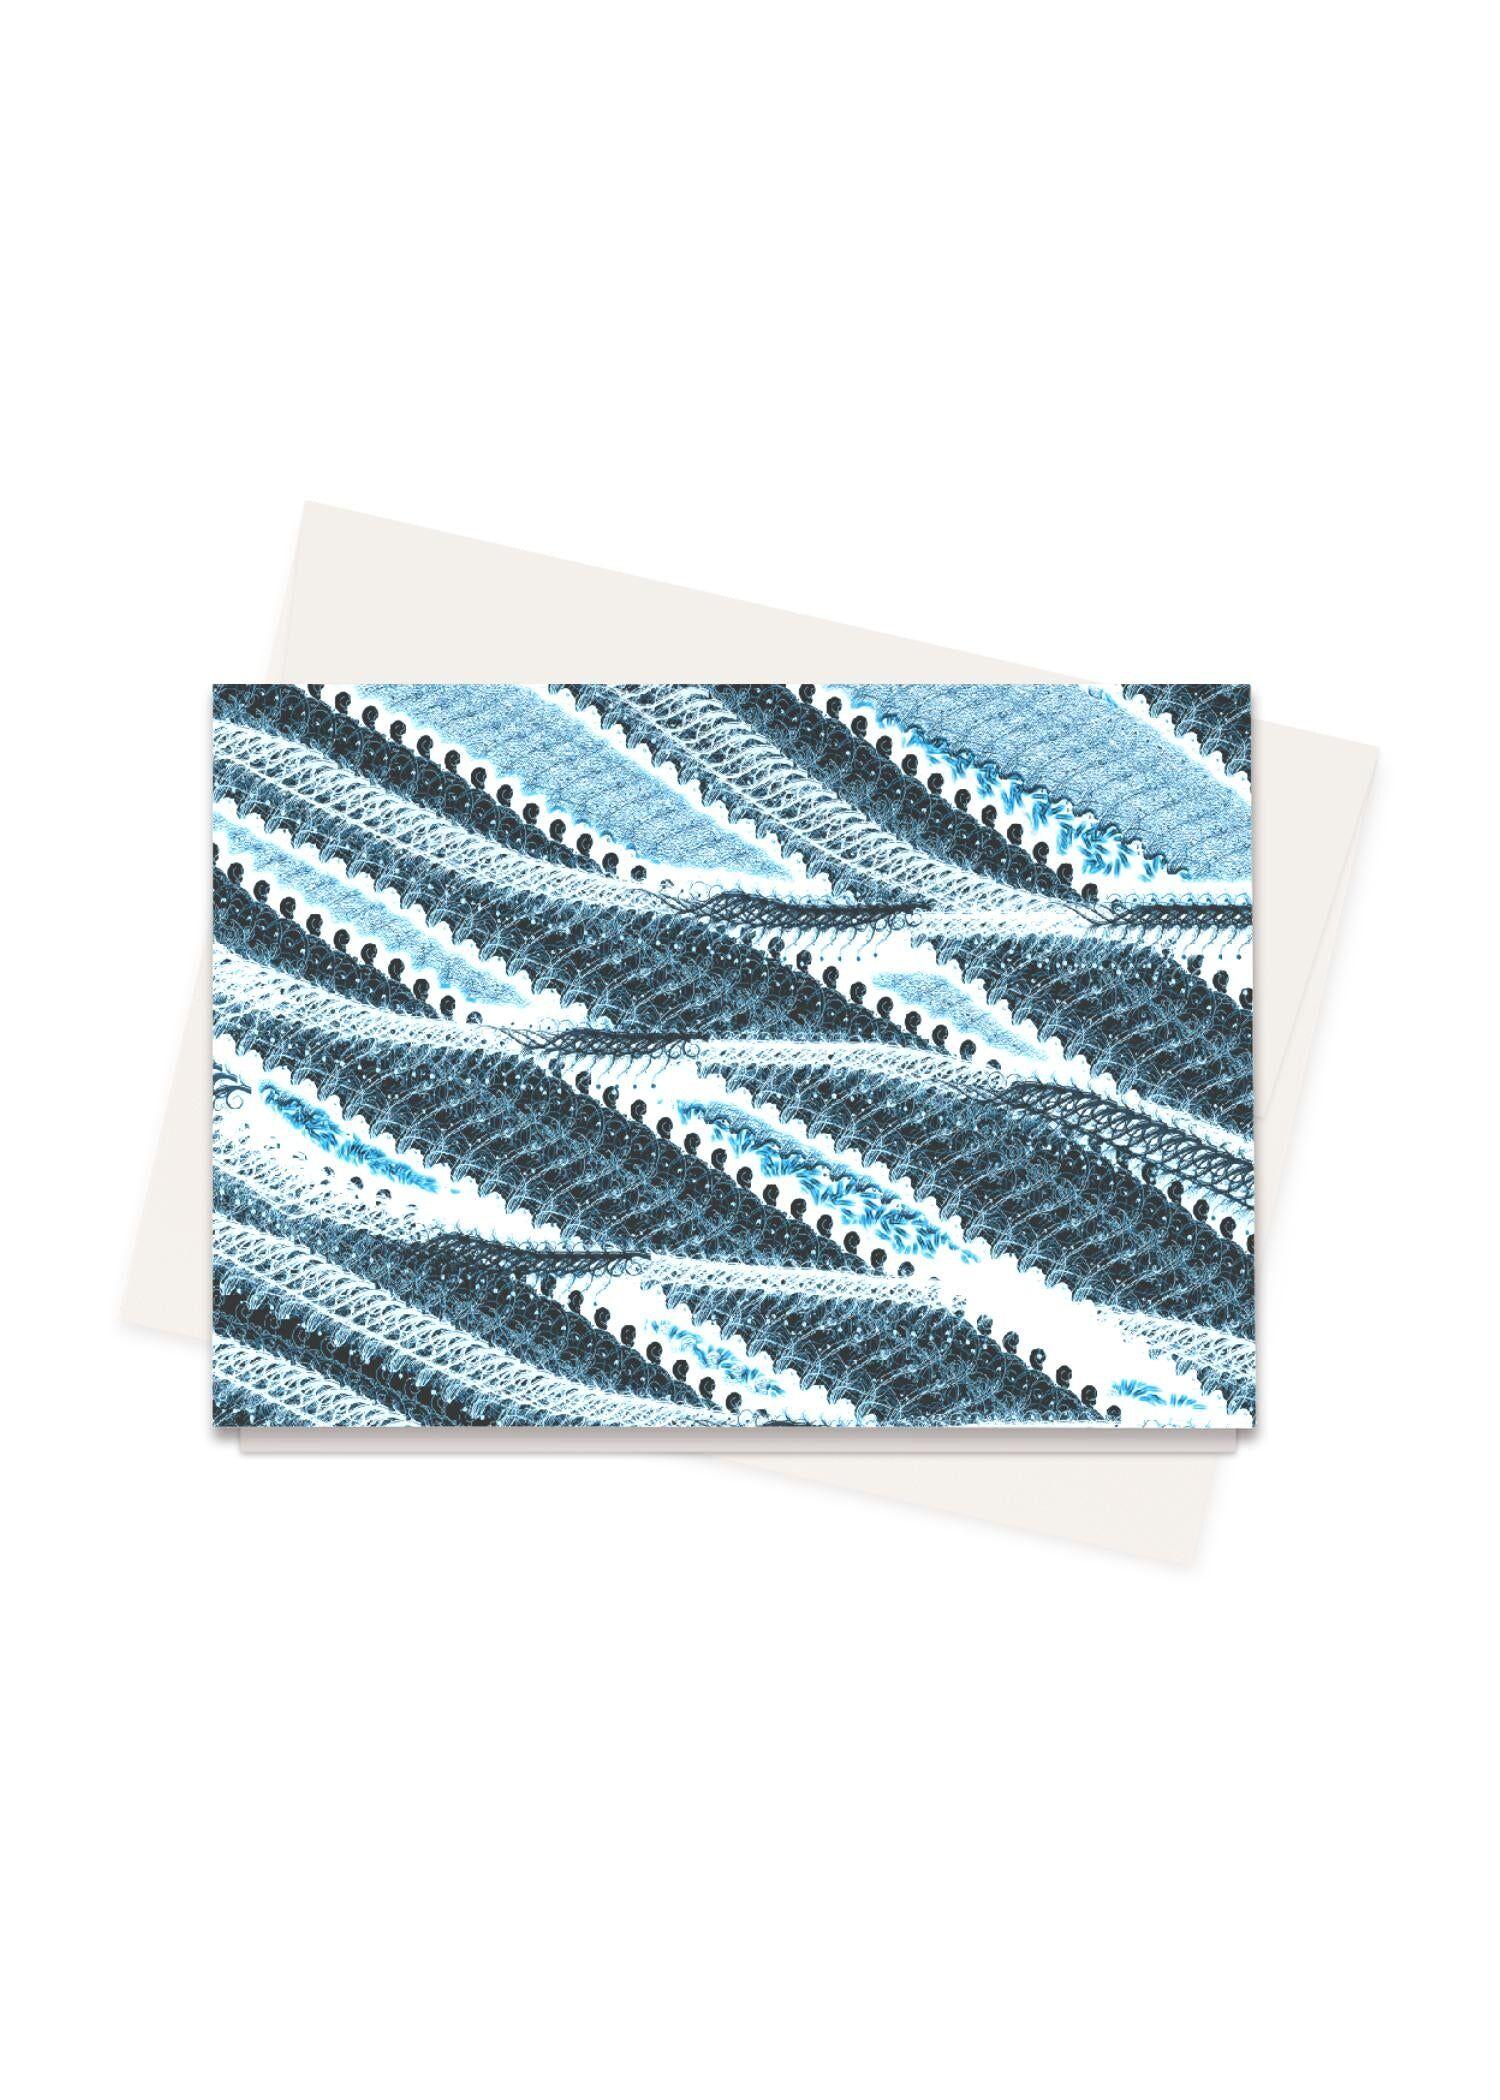 VIDA Greeting Cards Set - Arctic Waves by VIDA Original Artist  - Size: Set of 8